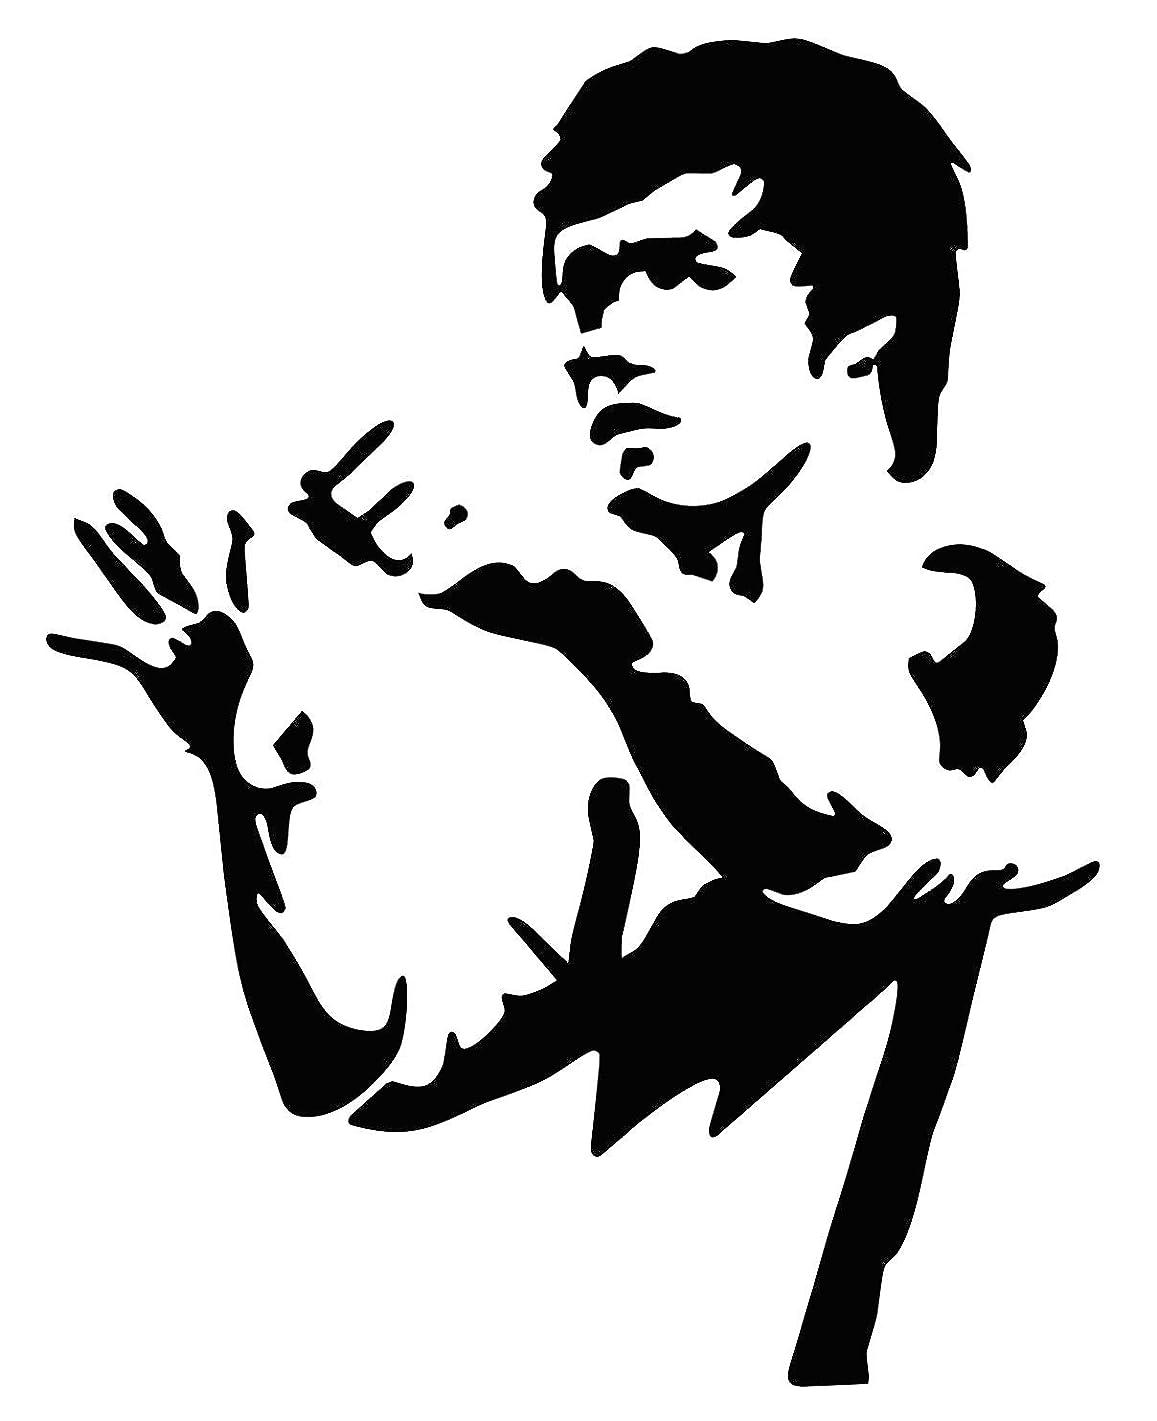 Karate Bruce Lee Martial Arts Wall Vinyl Decal Home Man Cave Decor Sticker